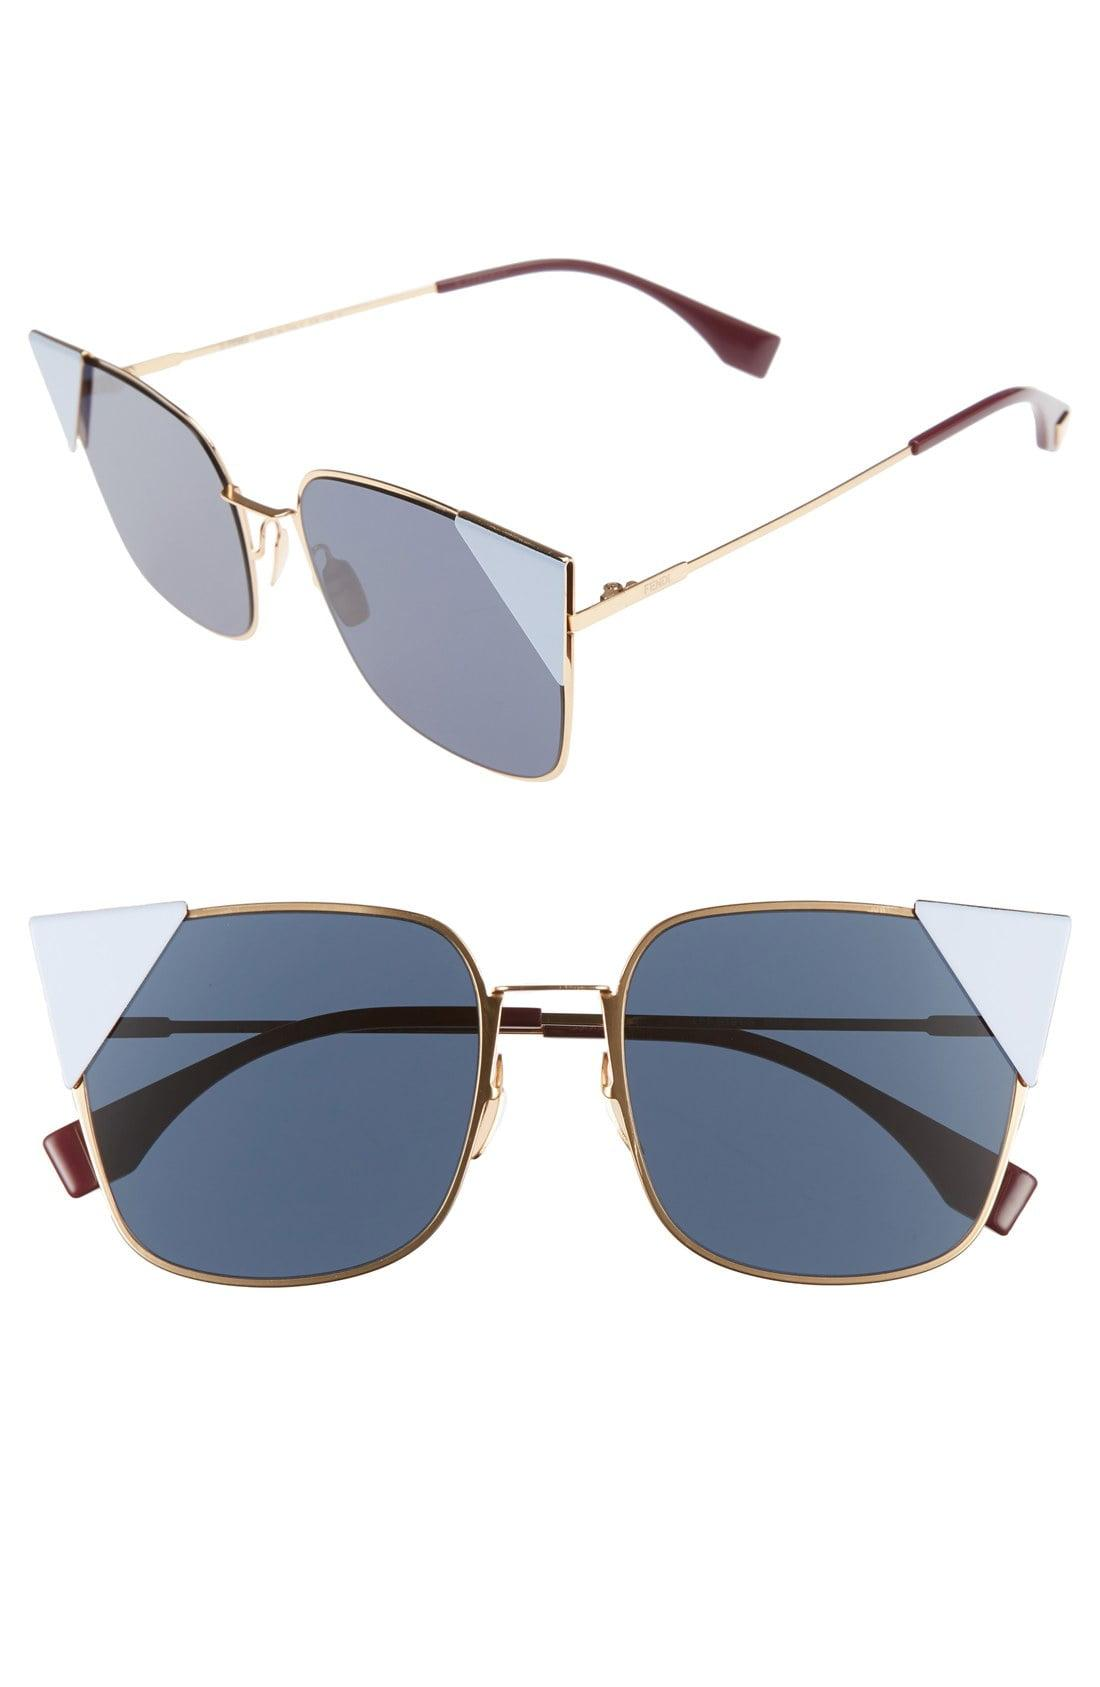 9320741fab0bd Fendi 55mm Tipped Cat Eye Sunglasses in Metallic - Lyst